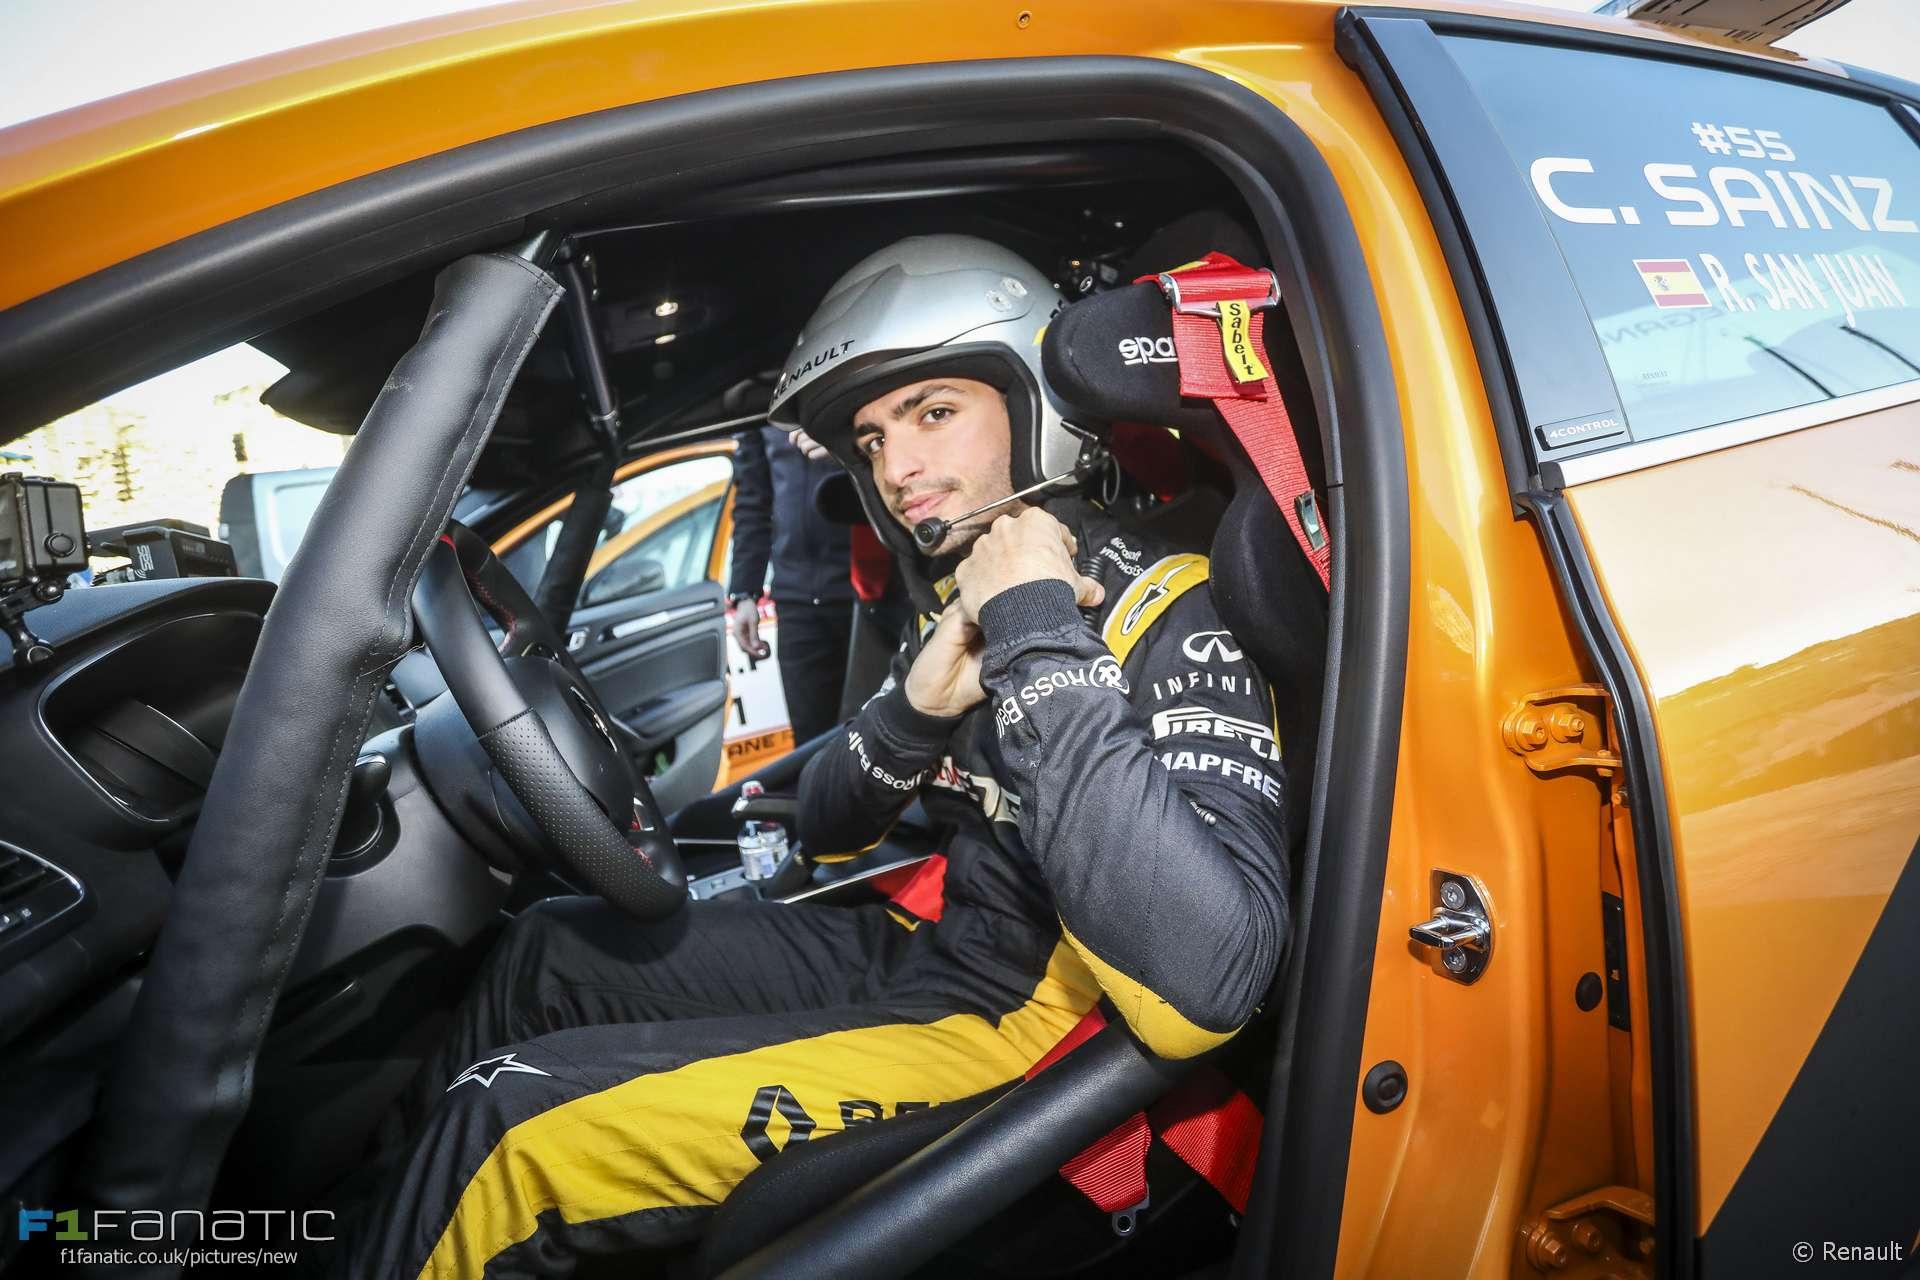 Carlos Sainz Jnr, Renault, Rallye Mote Carlo, 2018